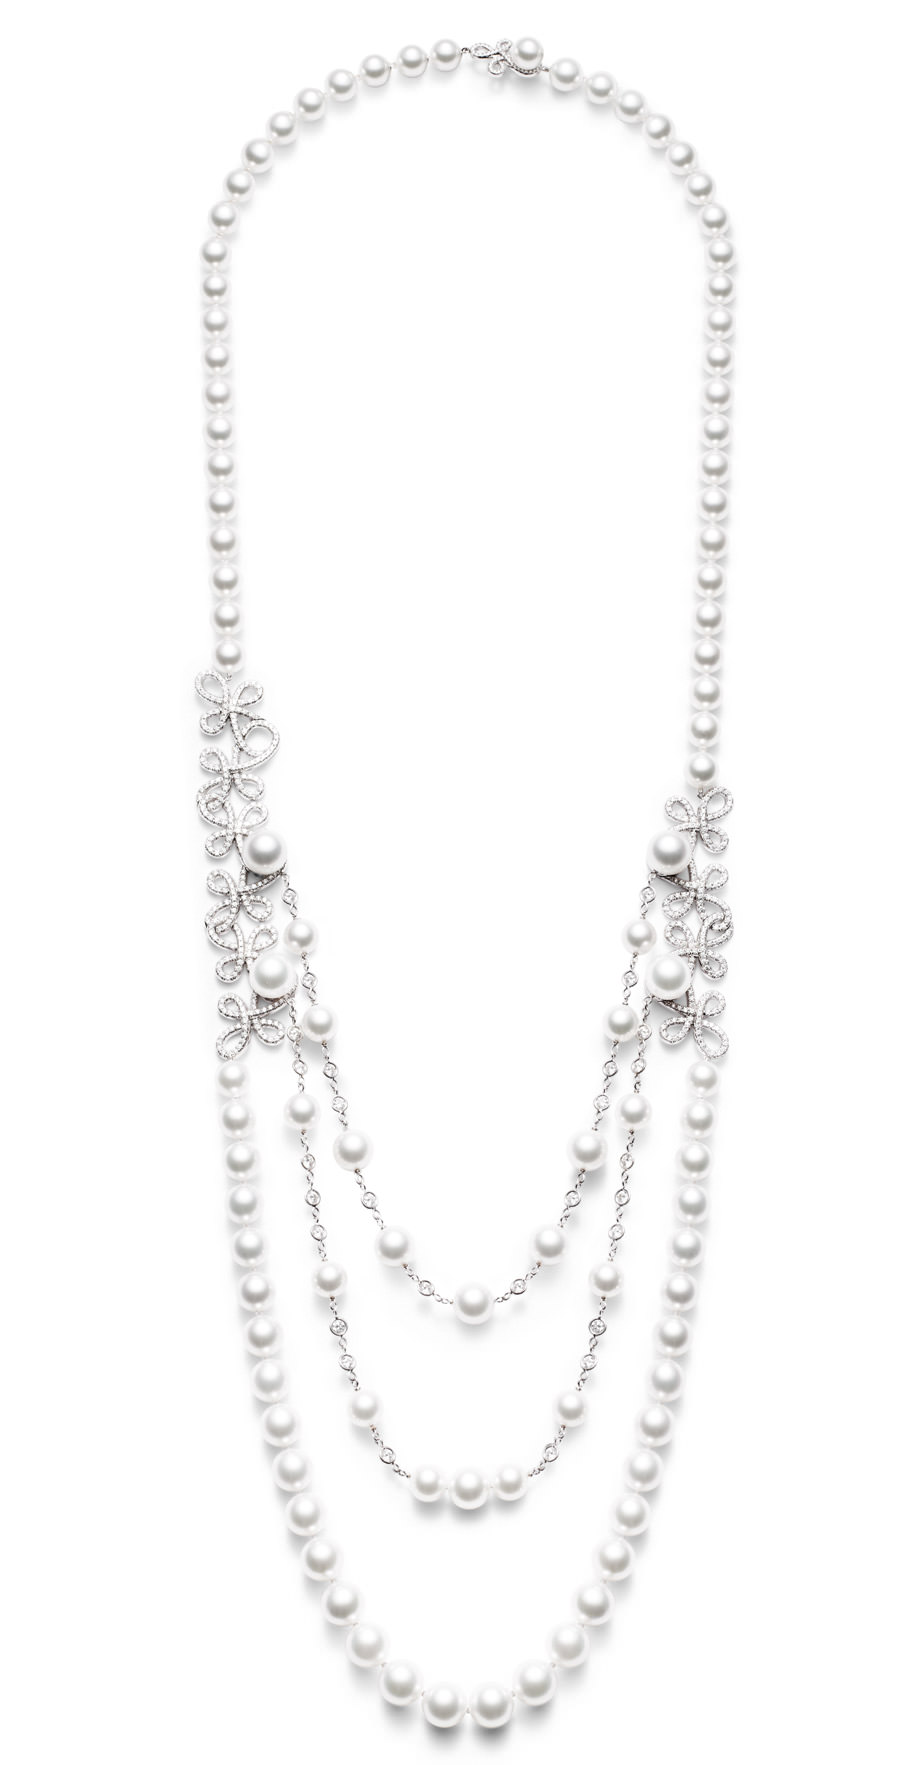 Collar Magnificent Adornments Inspiration